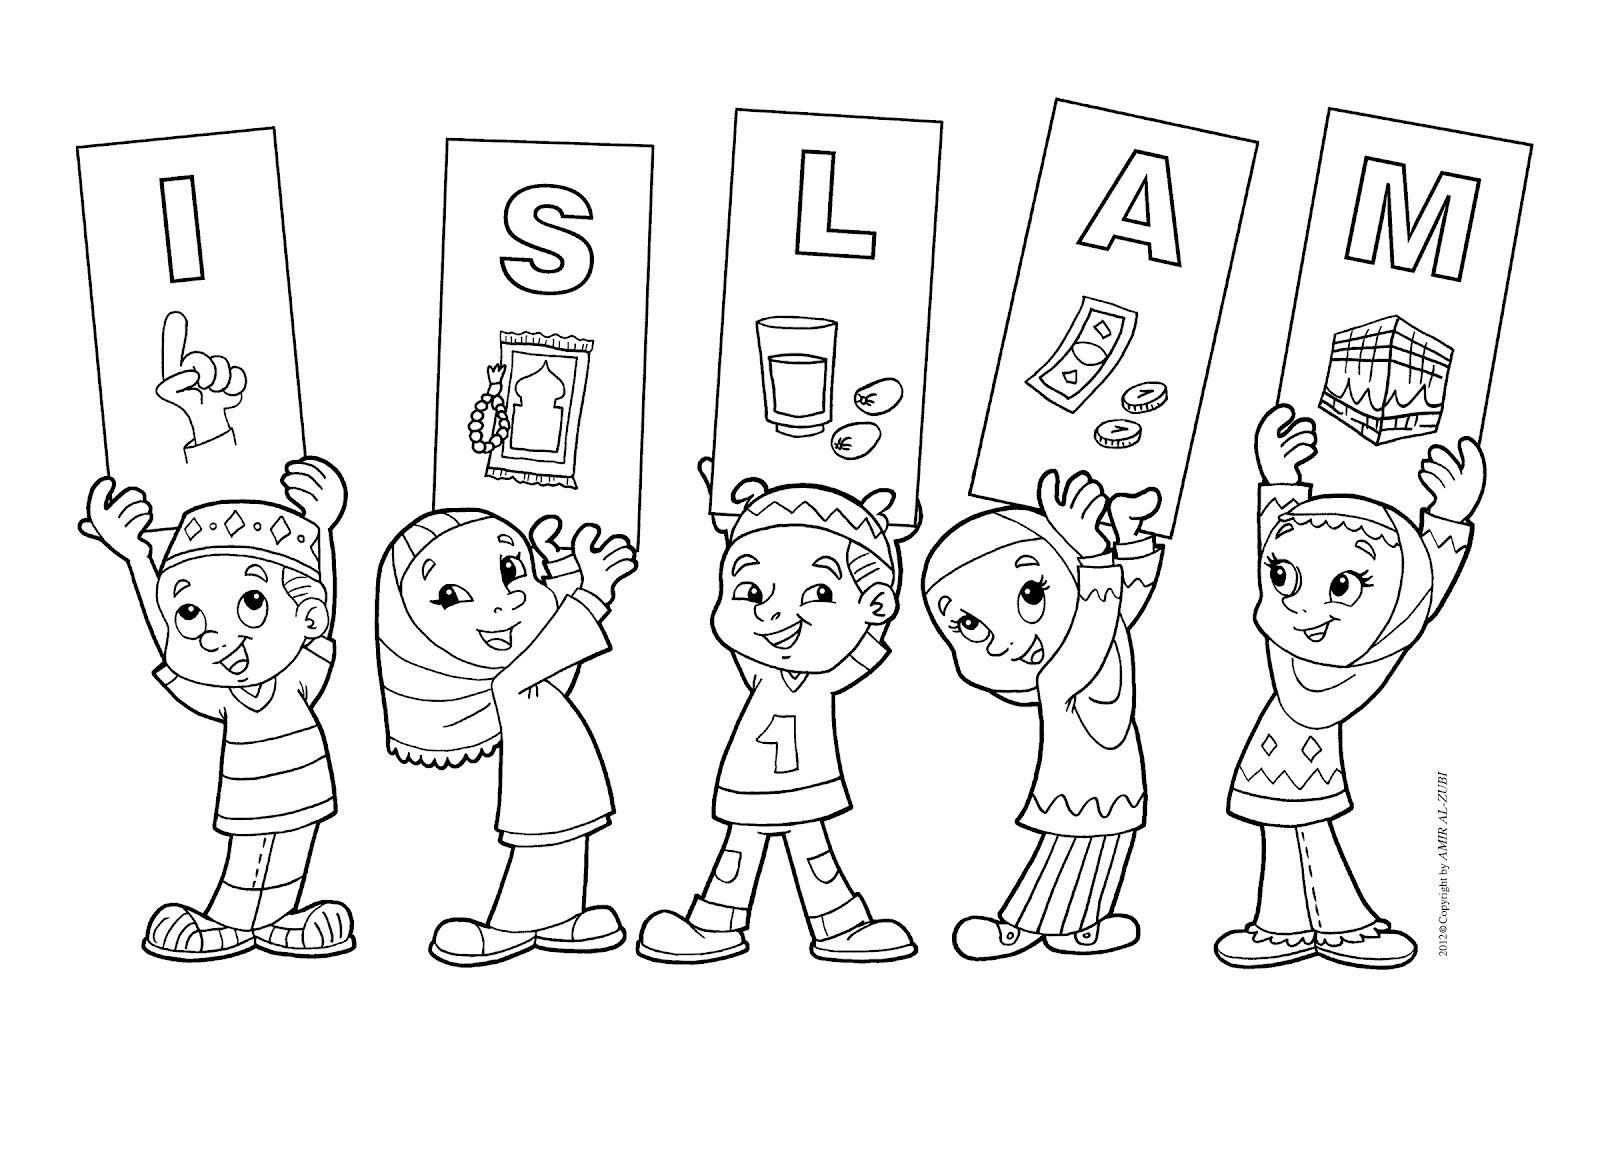 coloring for ramadan  säulen des islam ramadan für